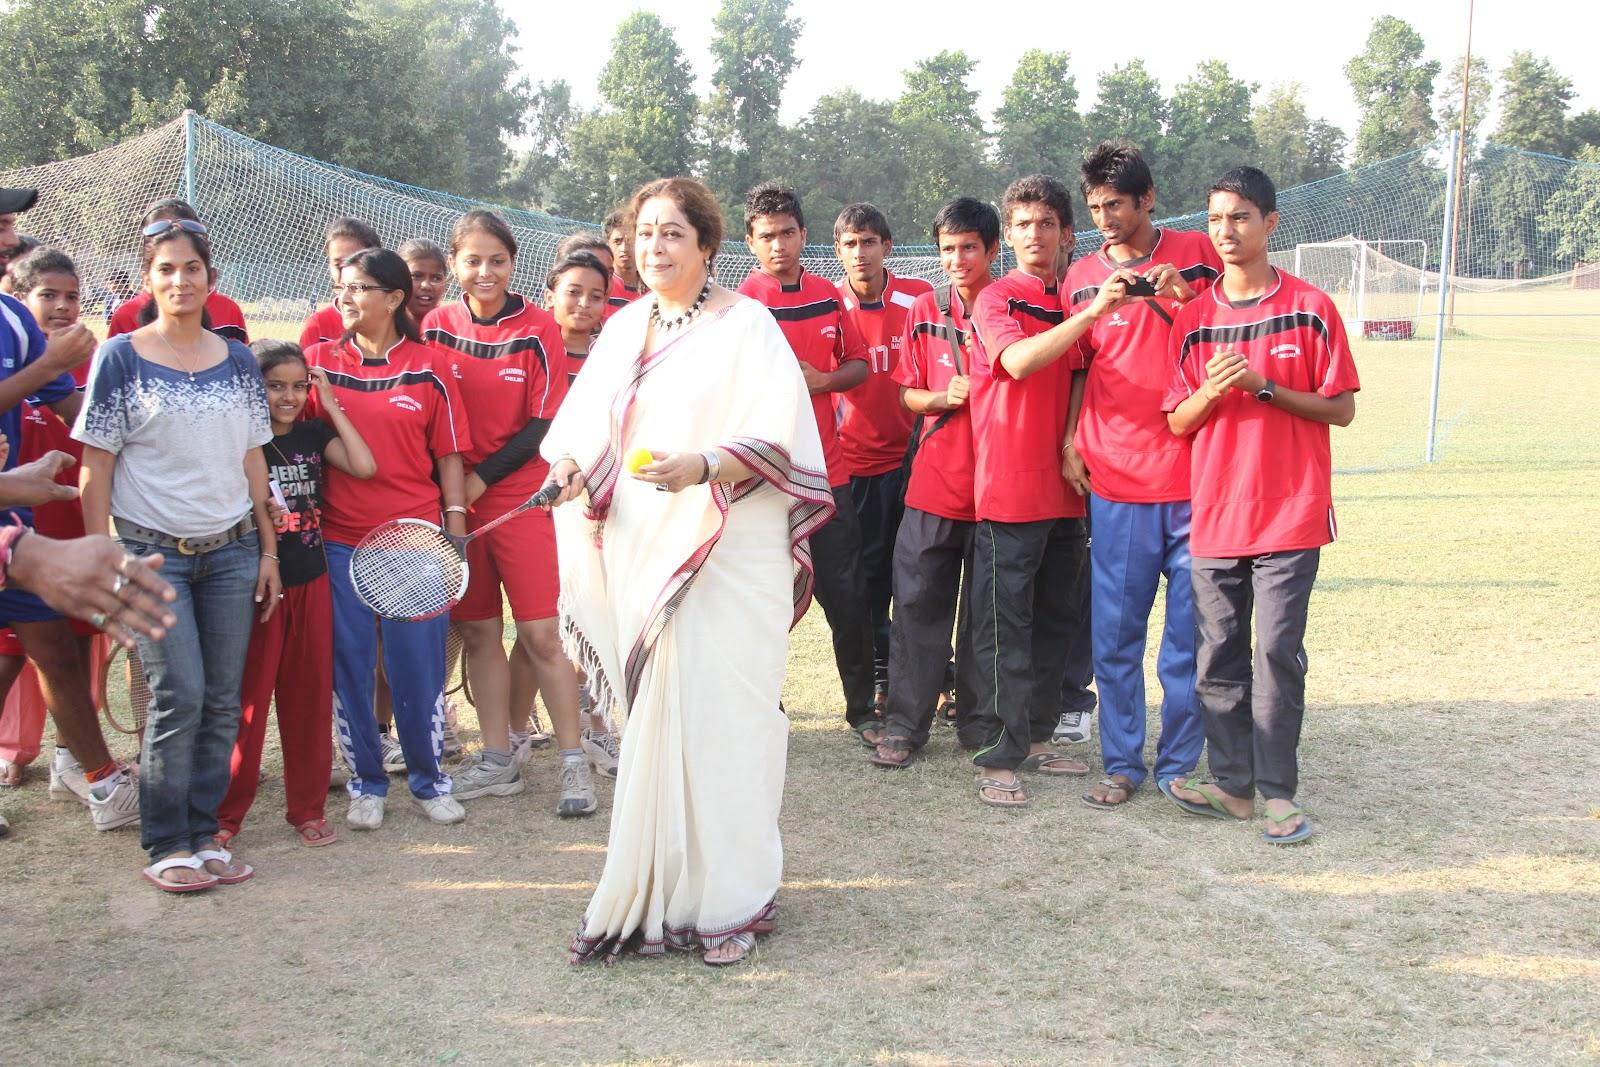 chandigarh women Dev samaj college of education, bed college,  dr neeru malik becomes chandigarh first women itt umpire by qualifying.